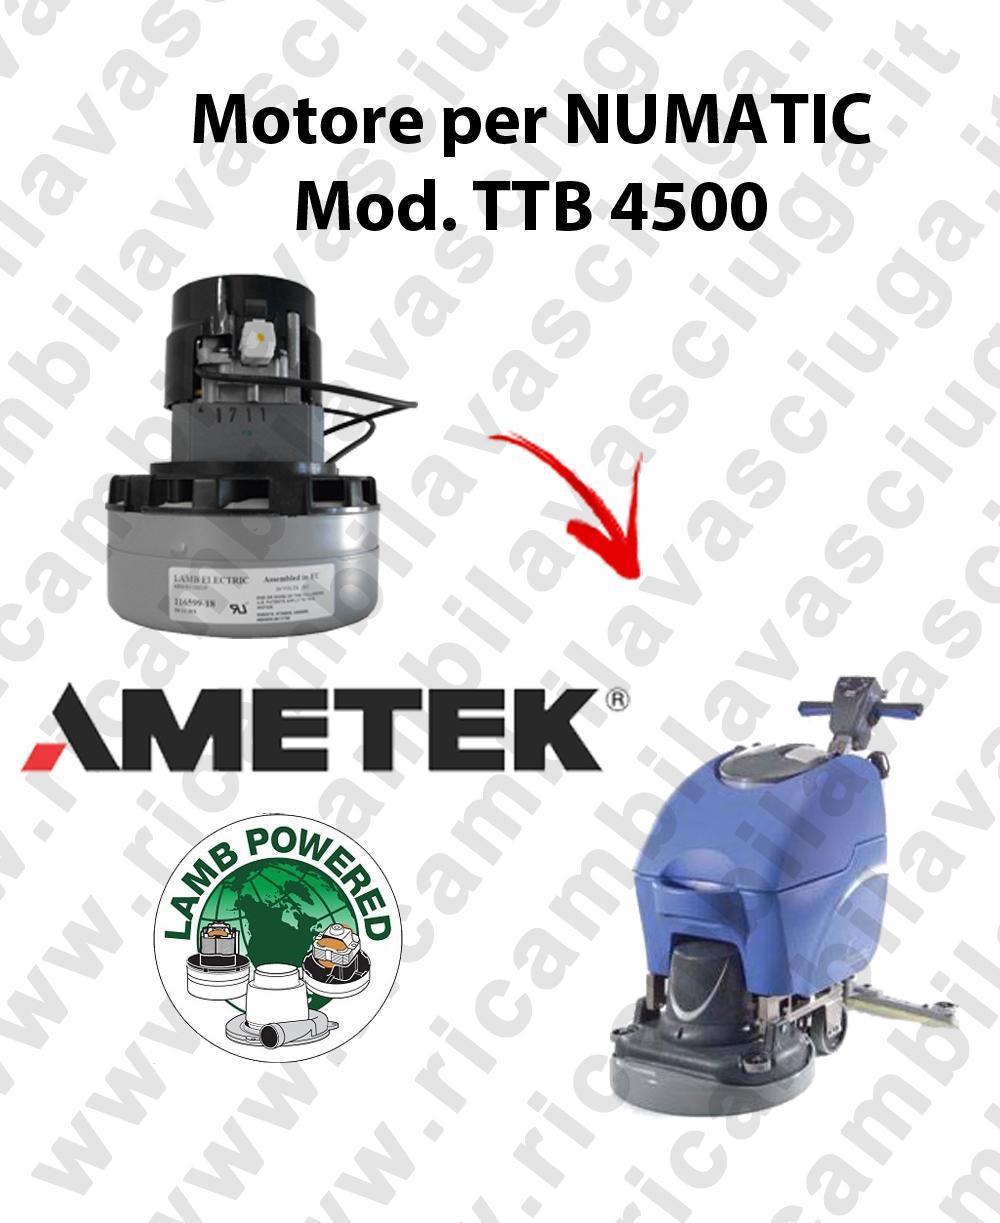 TTB 4500 Ametek Vacuum Motor scrubber dryer NUMATIC